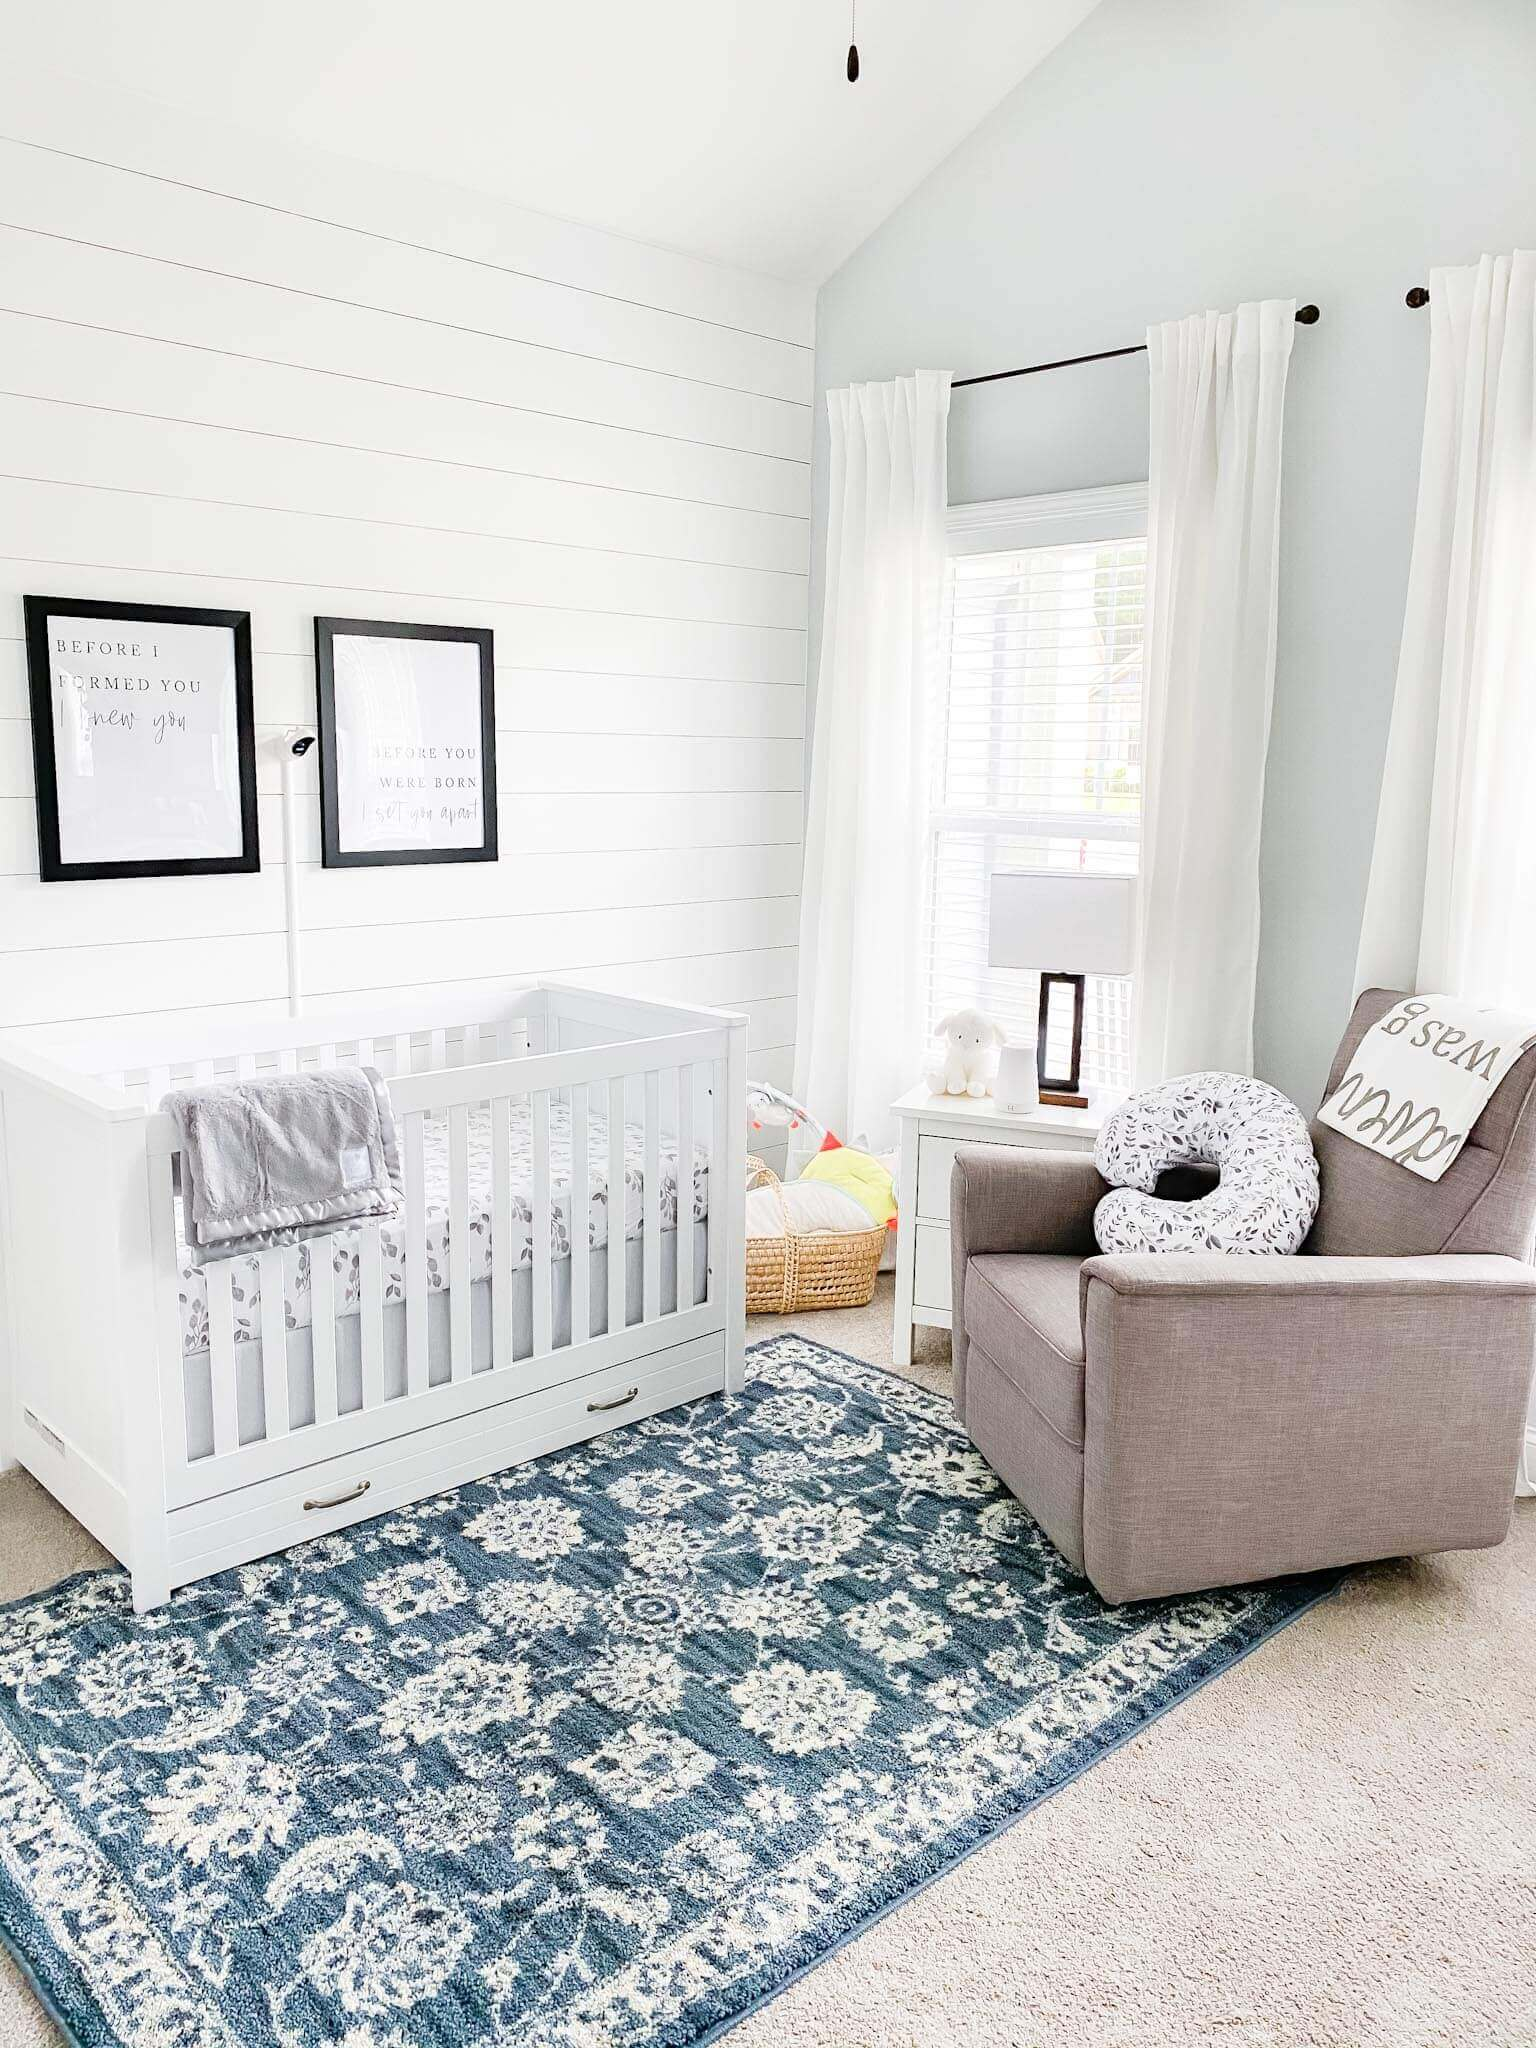 John Robert Nursery Reveal // Baby Boy Nursery // A Hosting Home Blog